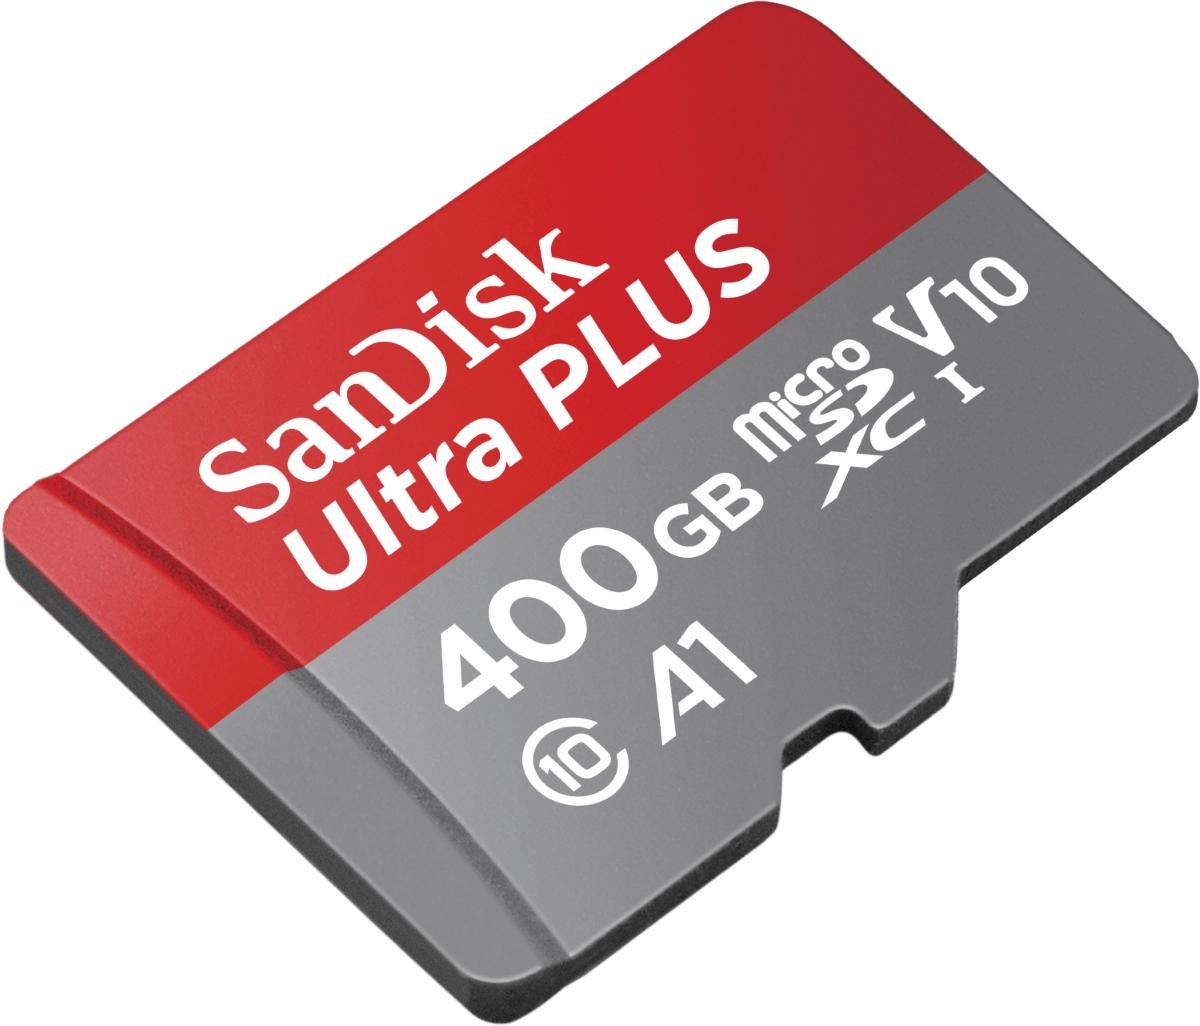 Western Digital показала самую быструю microSD-карту на 400 ГБ